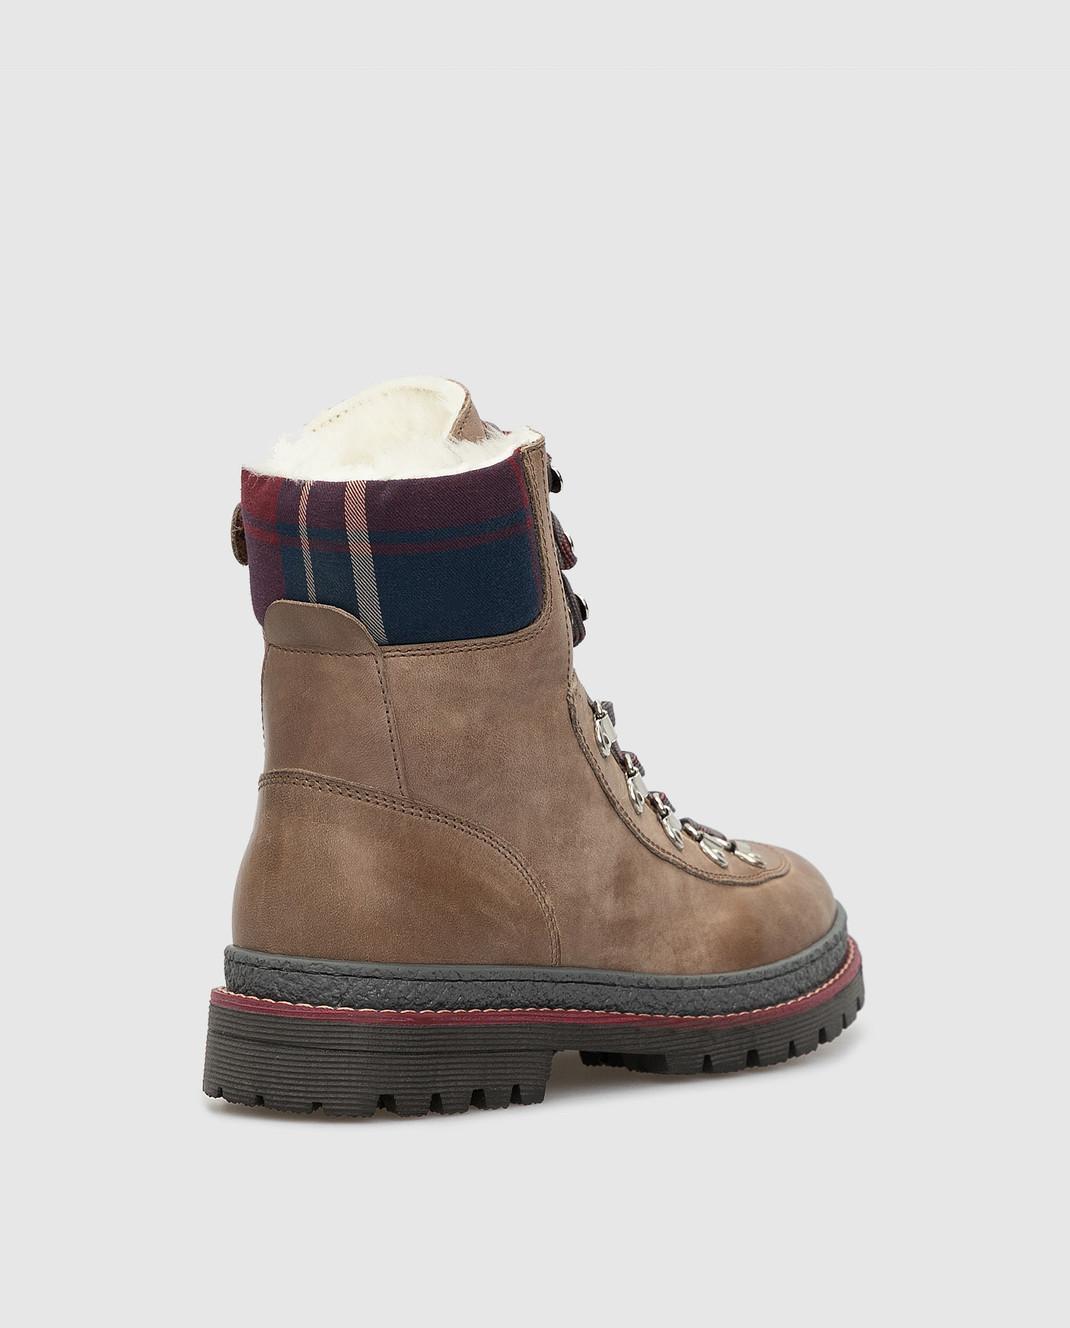 Brunello Cucinelli Детские бежевые кожаные ботинки изображение 3